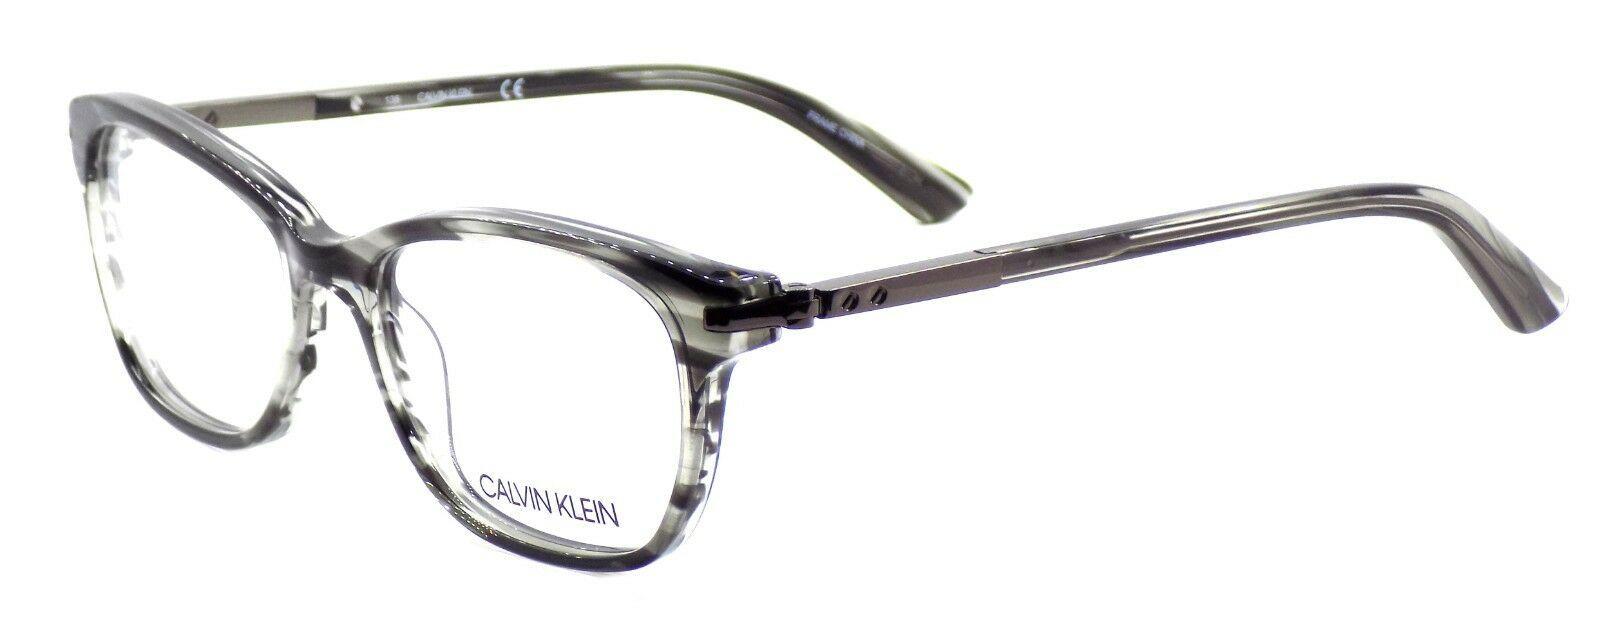 Calvin Klein CK7984 003 Women's Eyeglasses Frames Grey Horn 51-16-135 + CASE